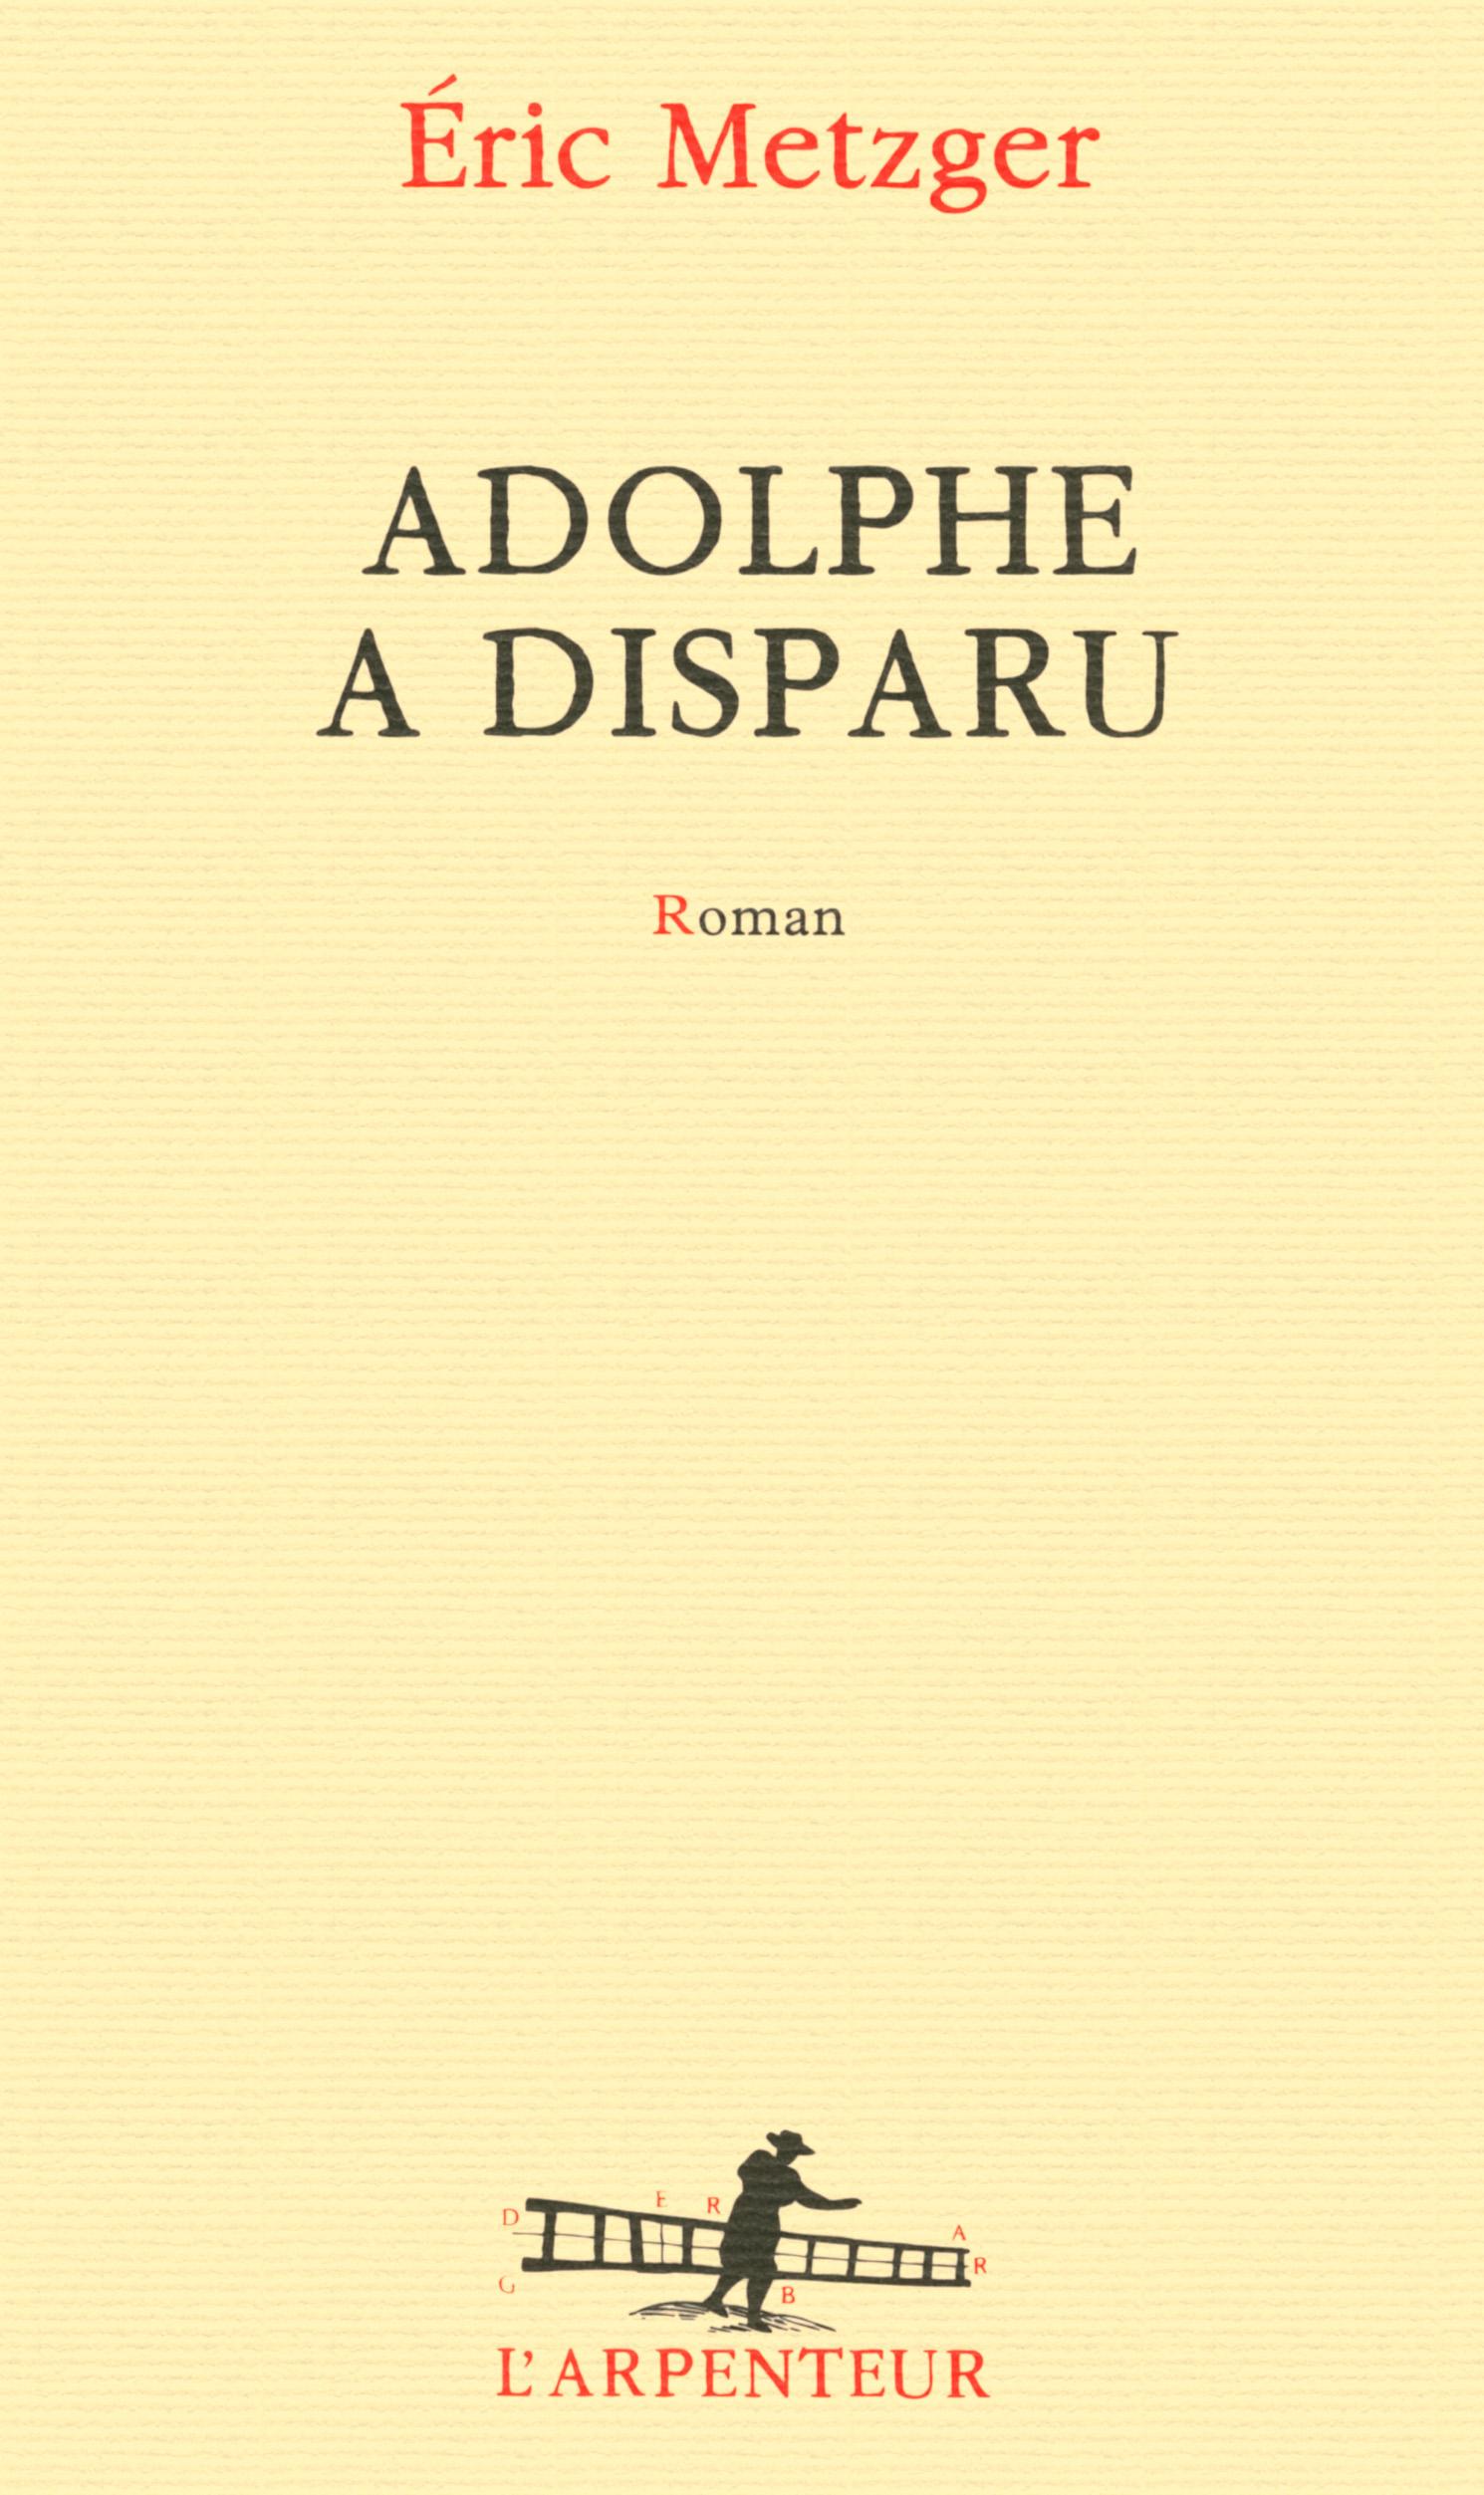 Adolphe a disparu